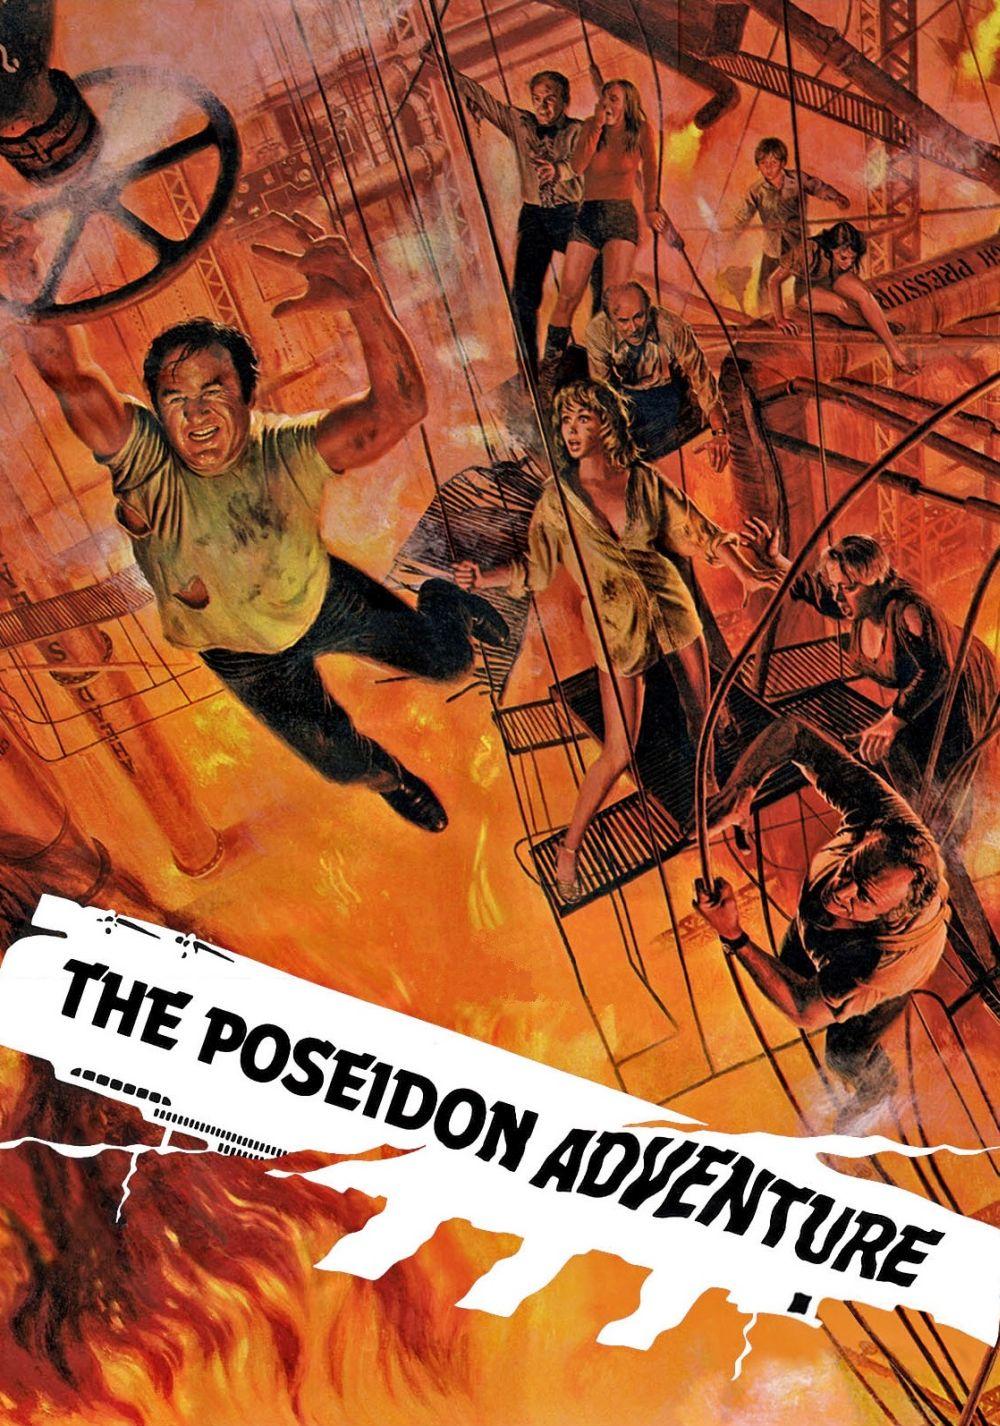 The Poseidon Adventure Movie Poster Id 138745 Image Abyss